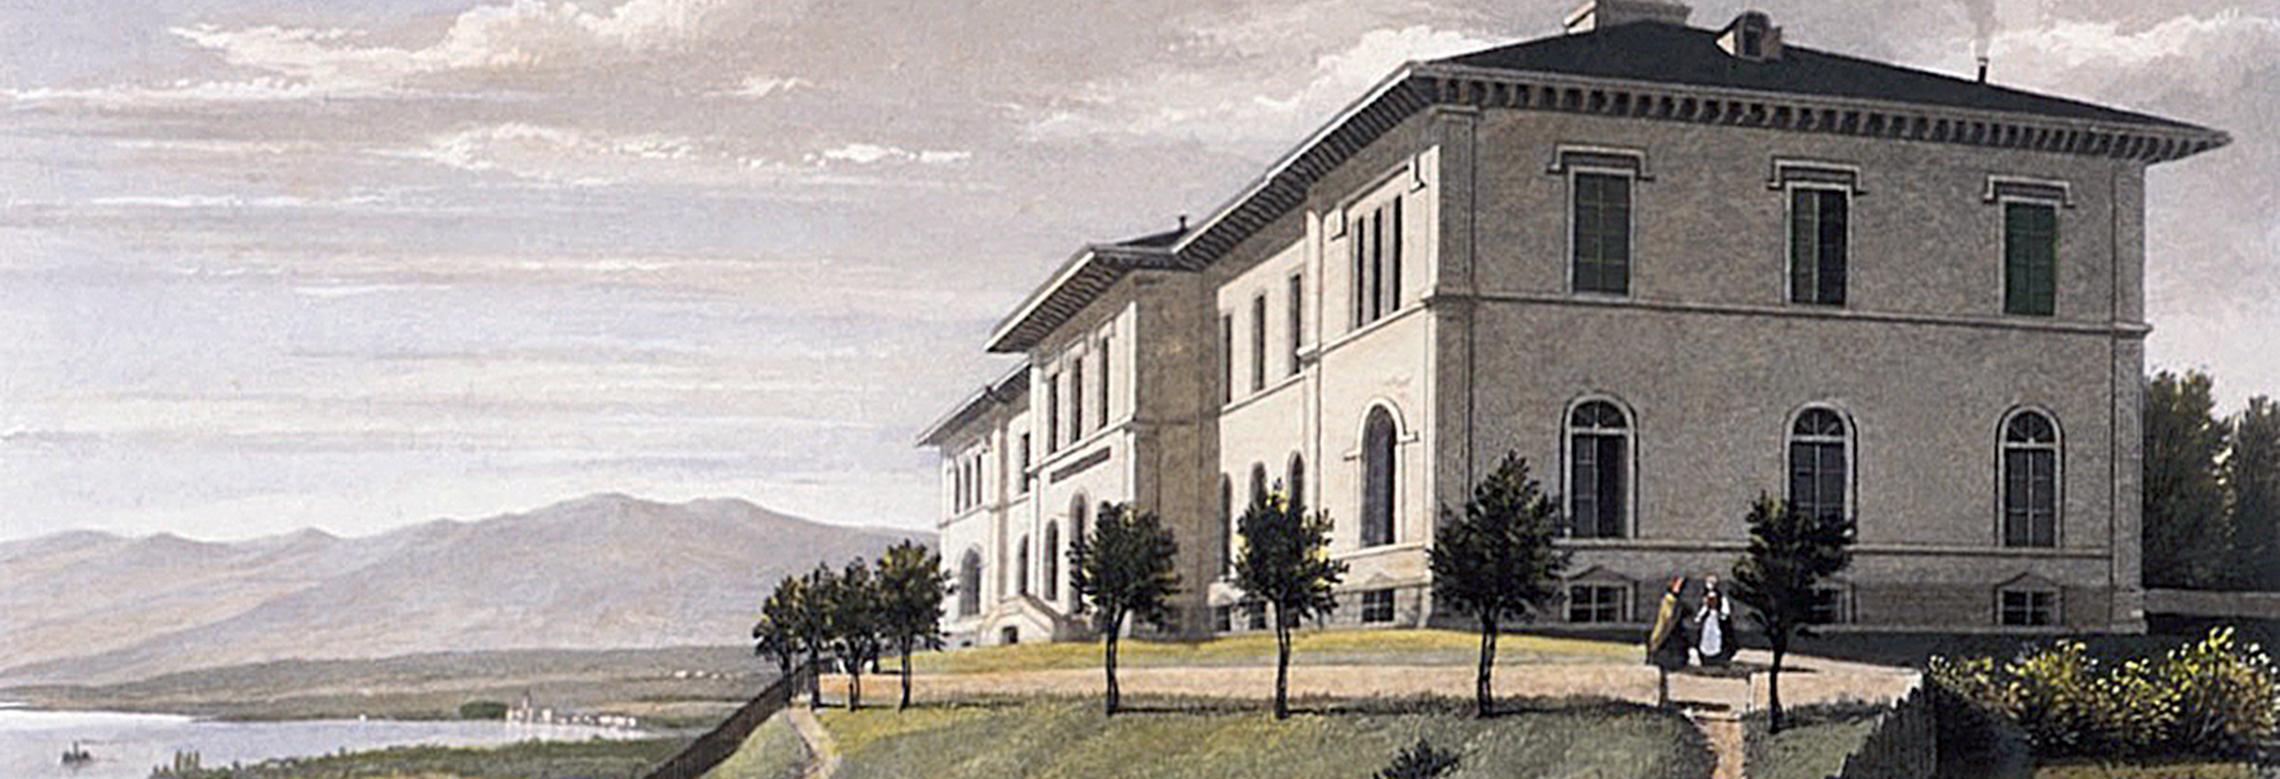 Image d'une gravure de l'Institut vers 1850